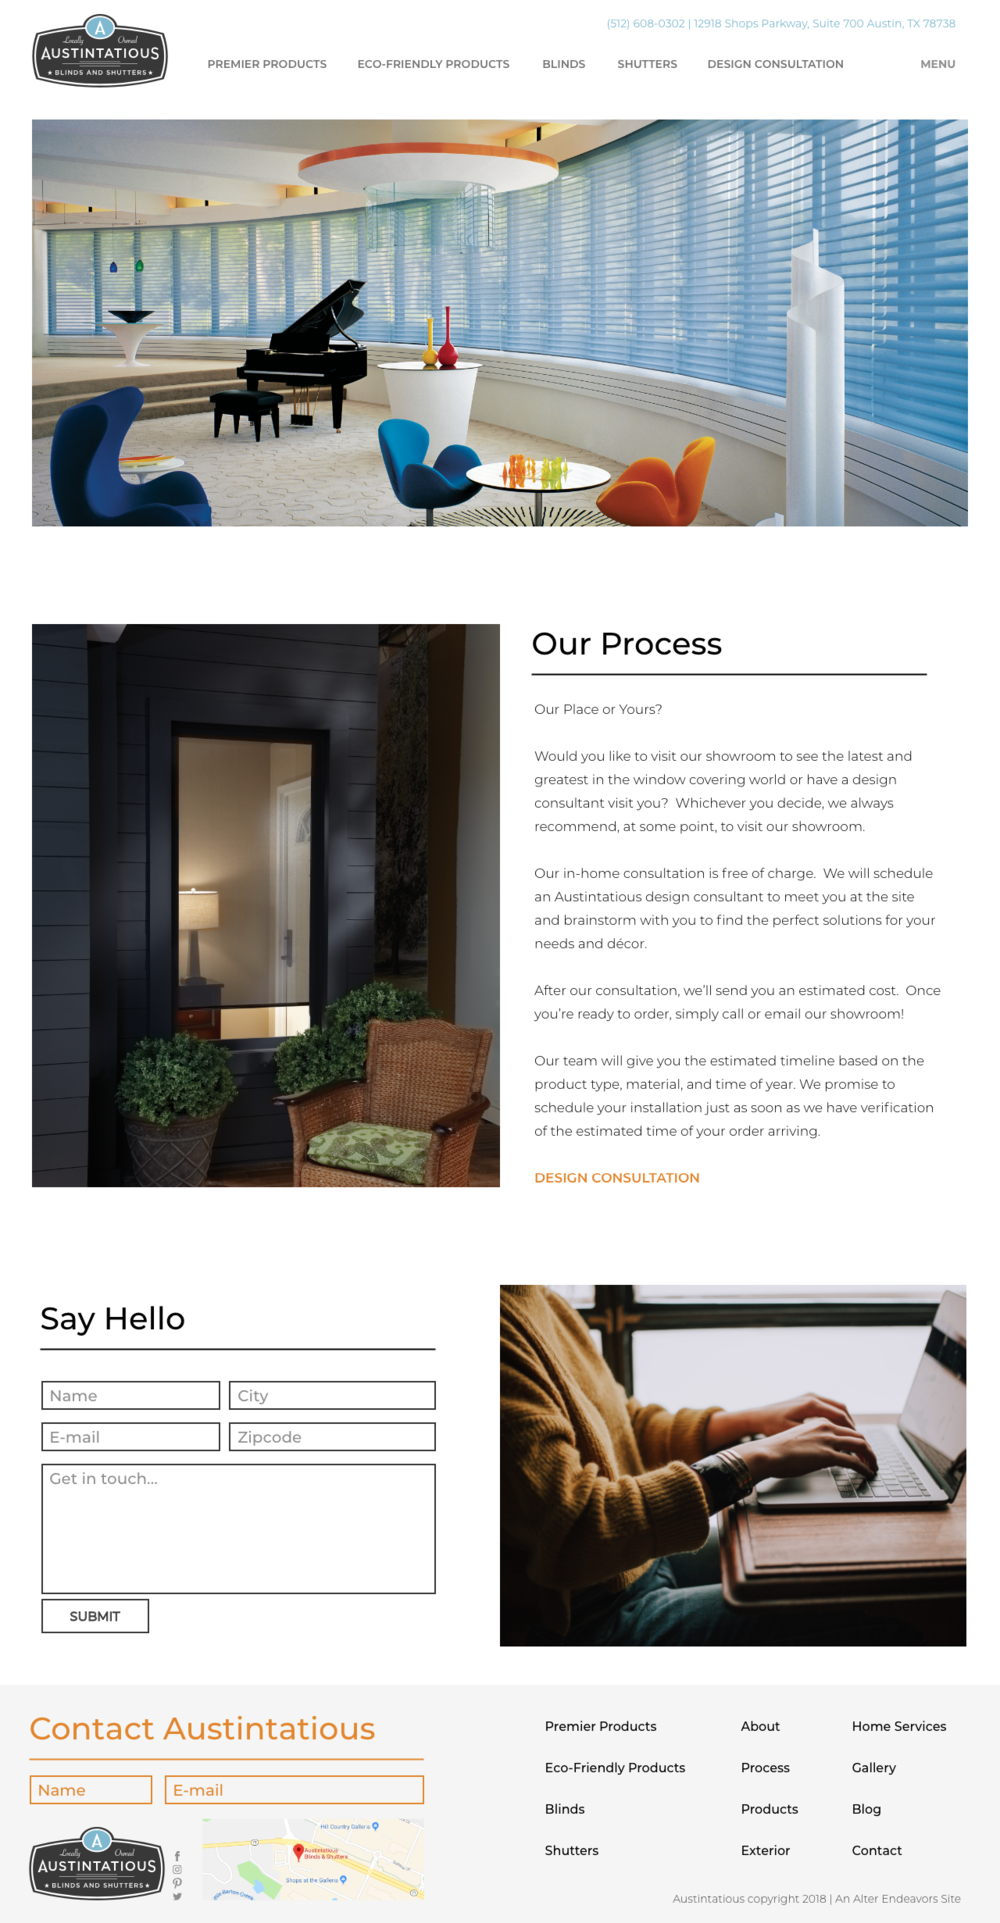 Austintatious Process Page.png